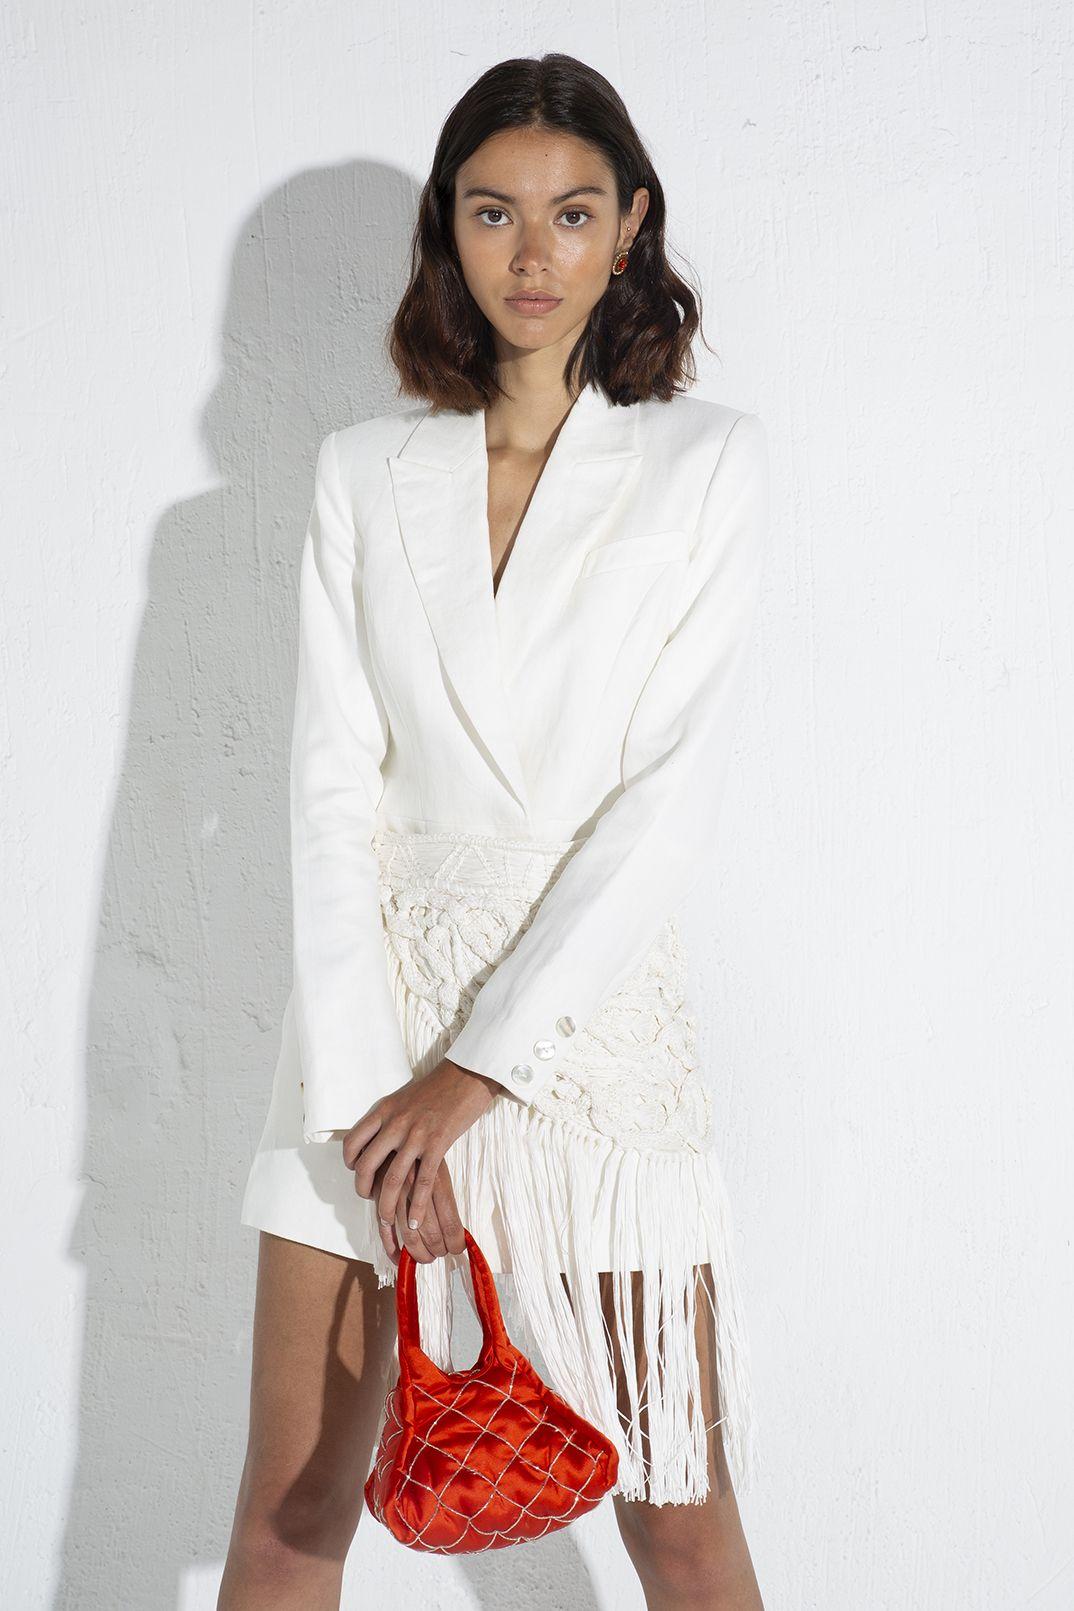 alexis-pamela-traje-vestido-cinturon-9